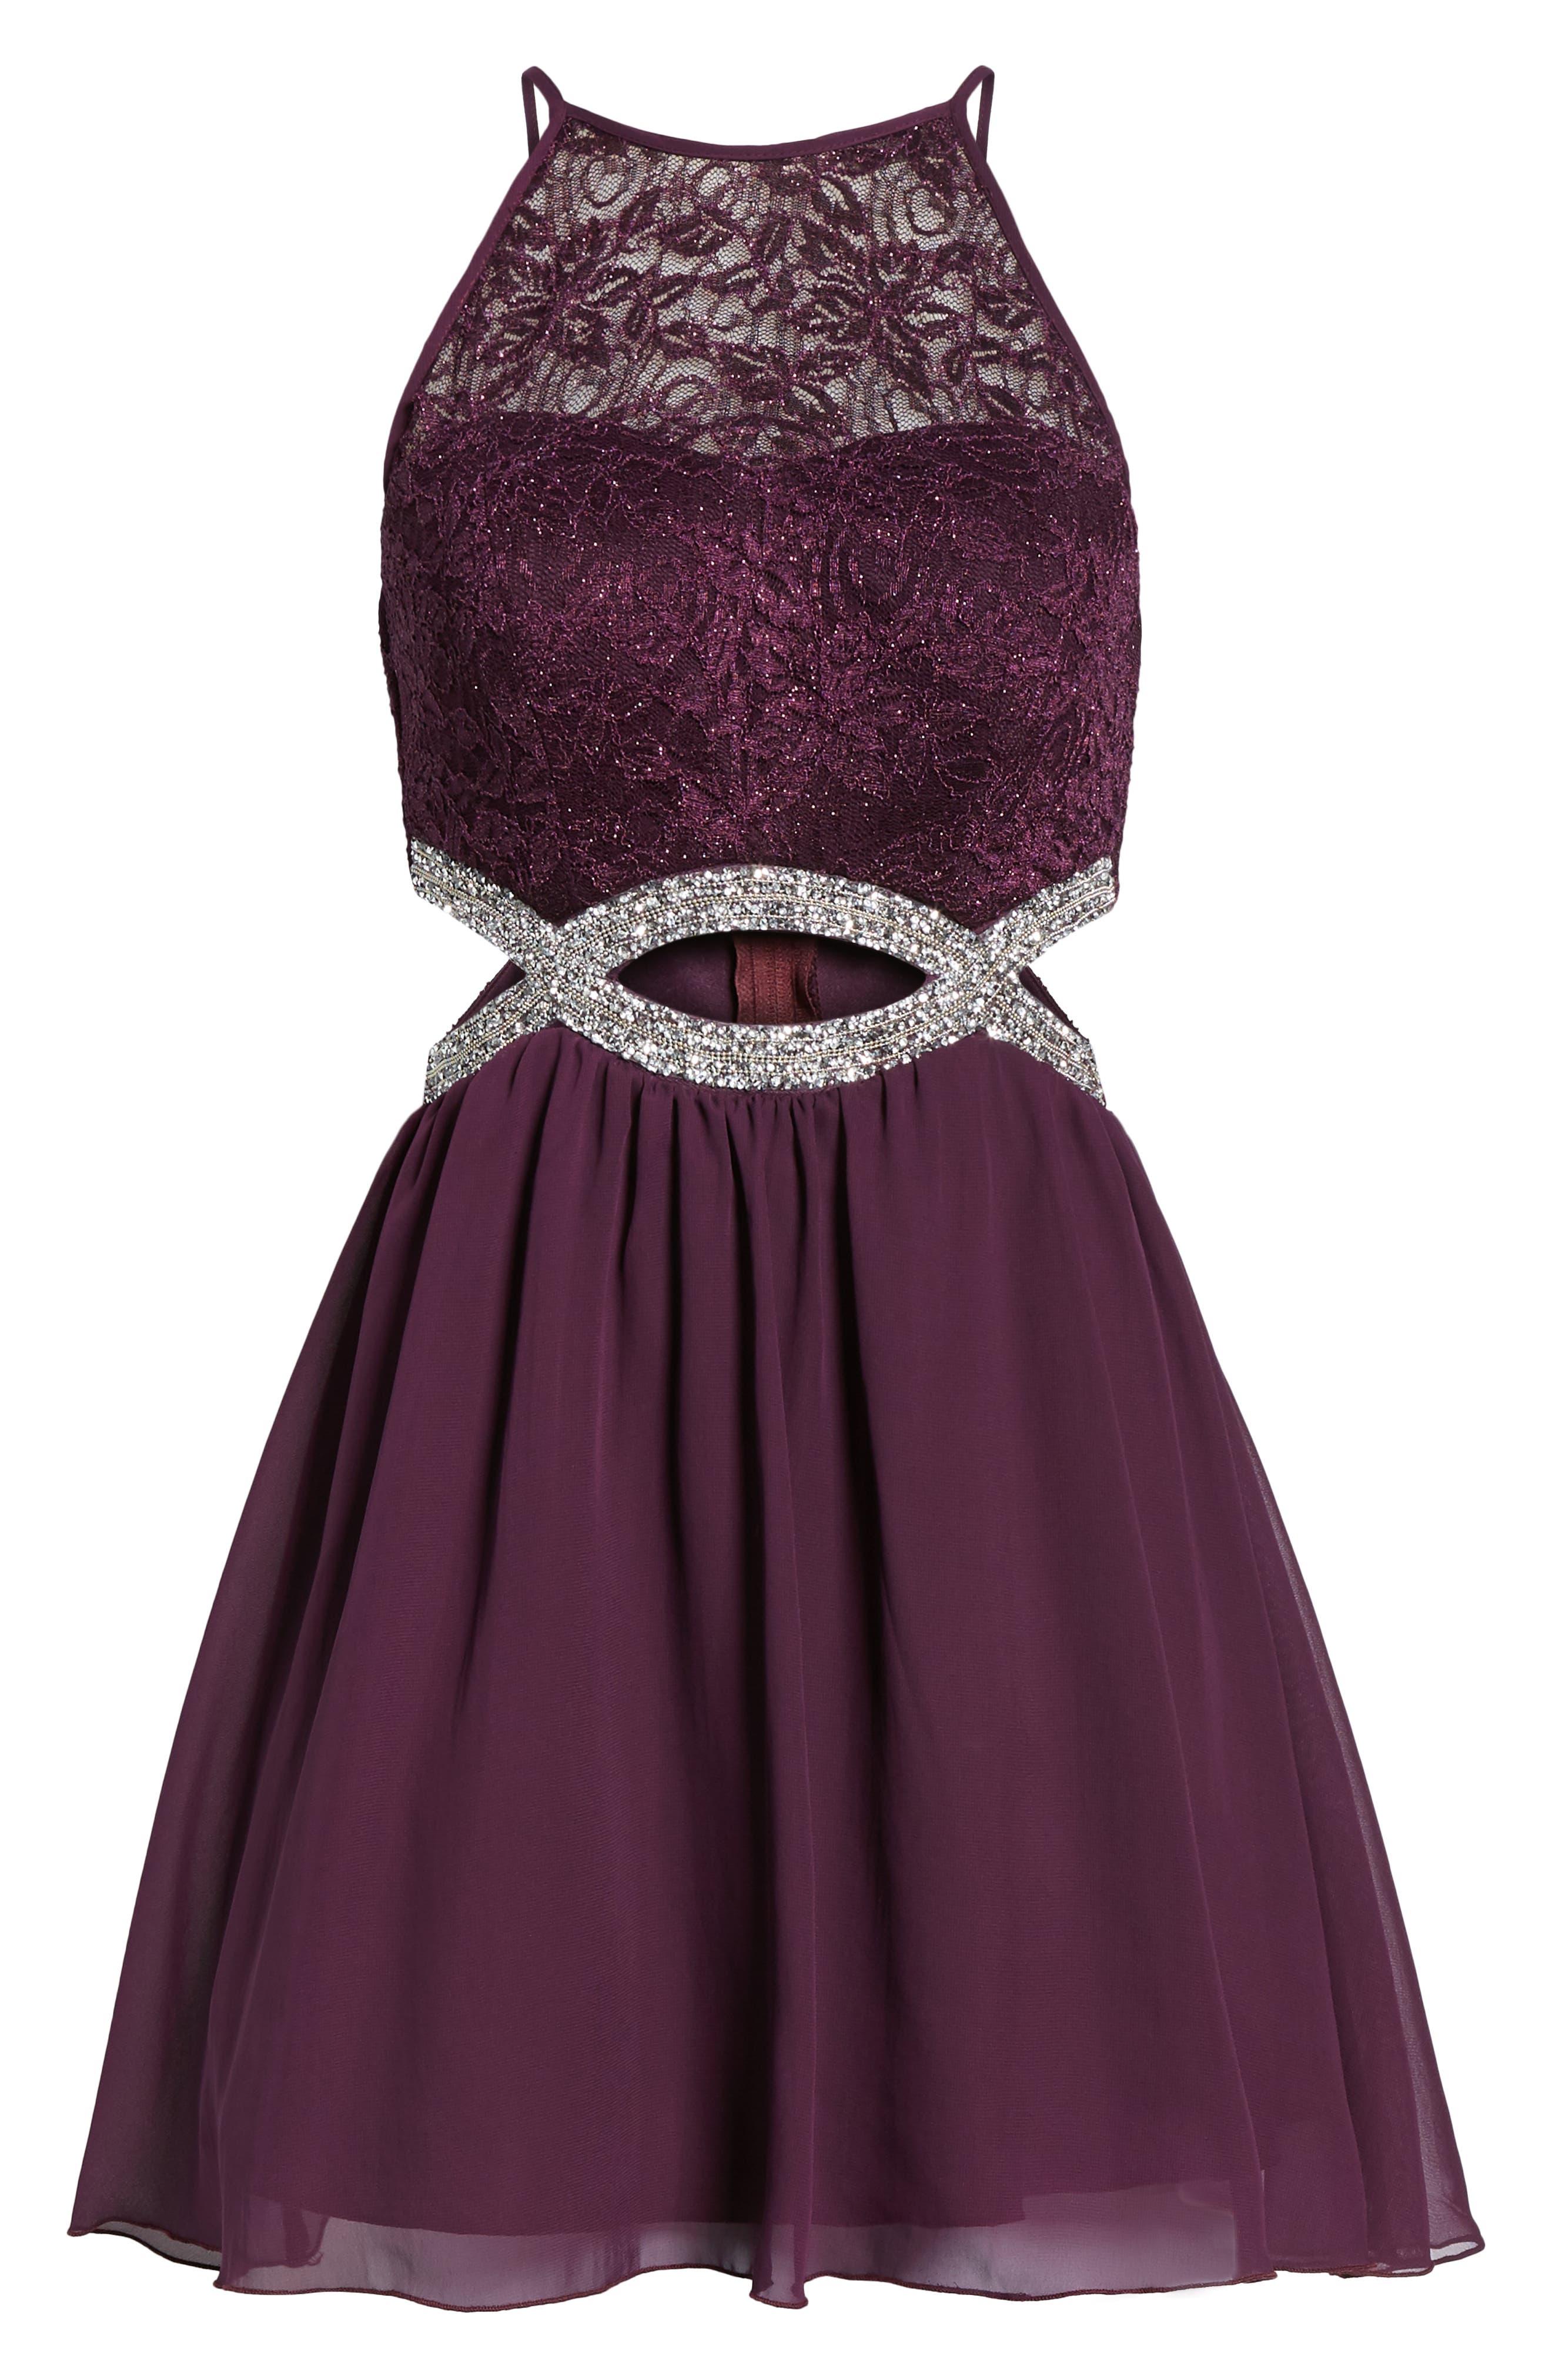 Lace Halter Dress,                             Alternate thumbnail 7, color,                             BERRY WINE